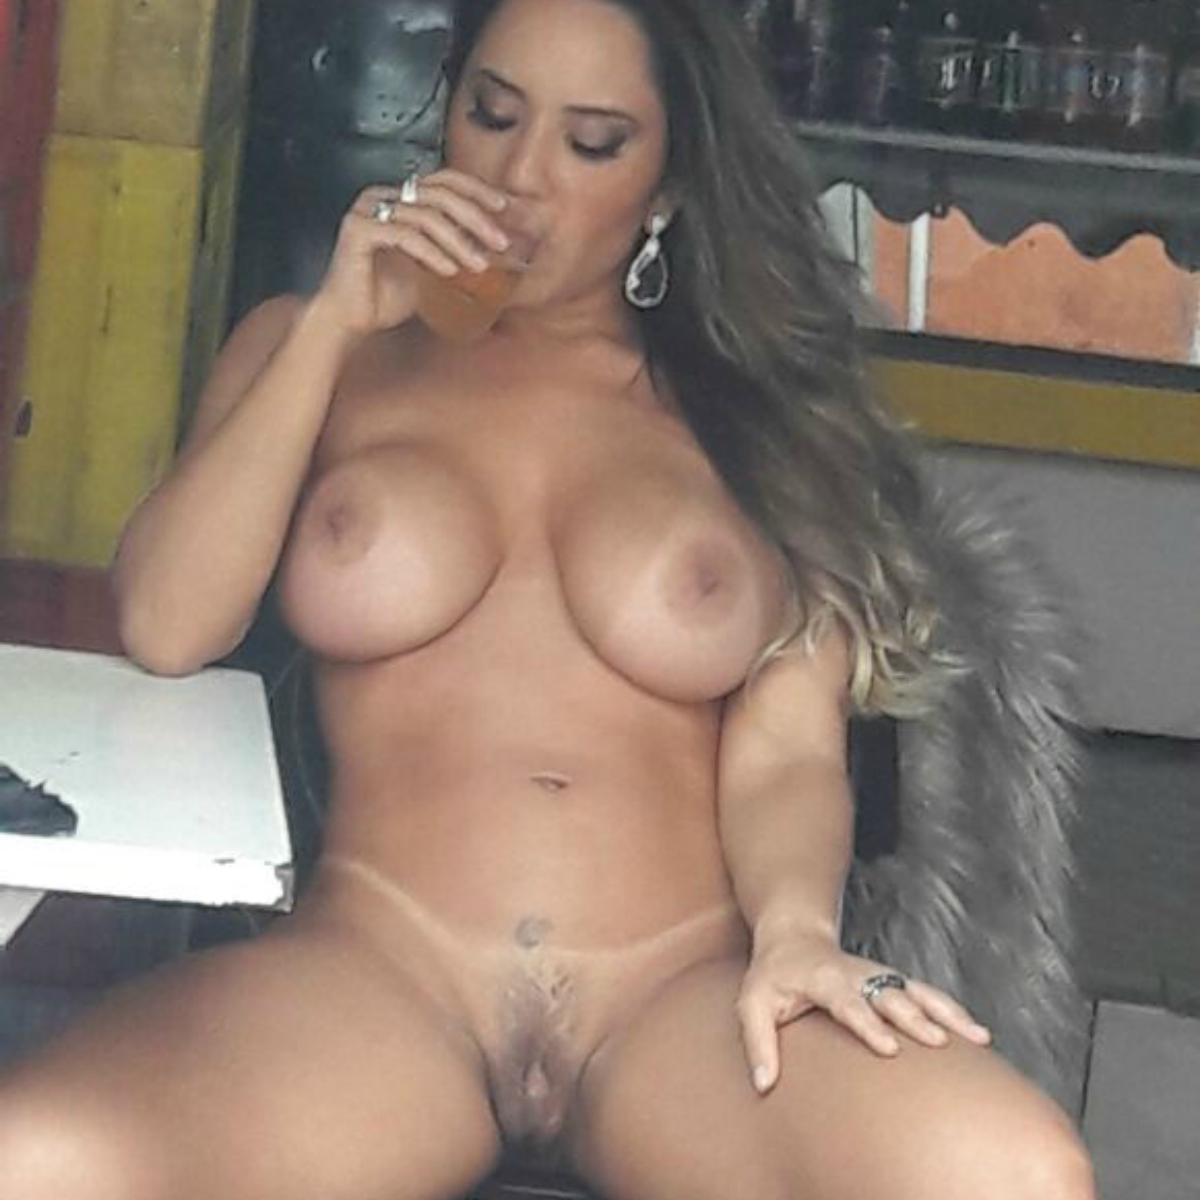 American hustle amy adams nude